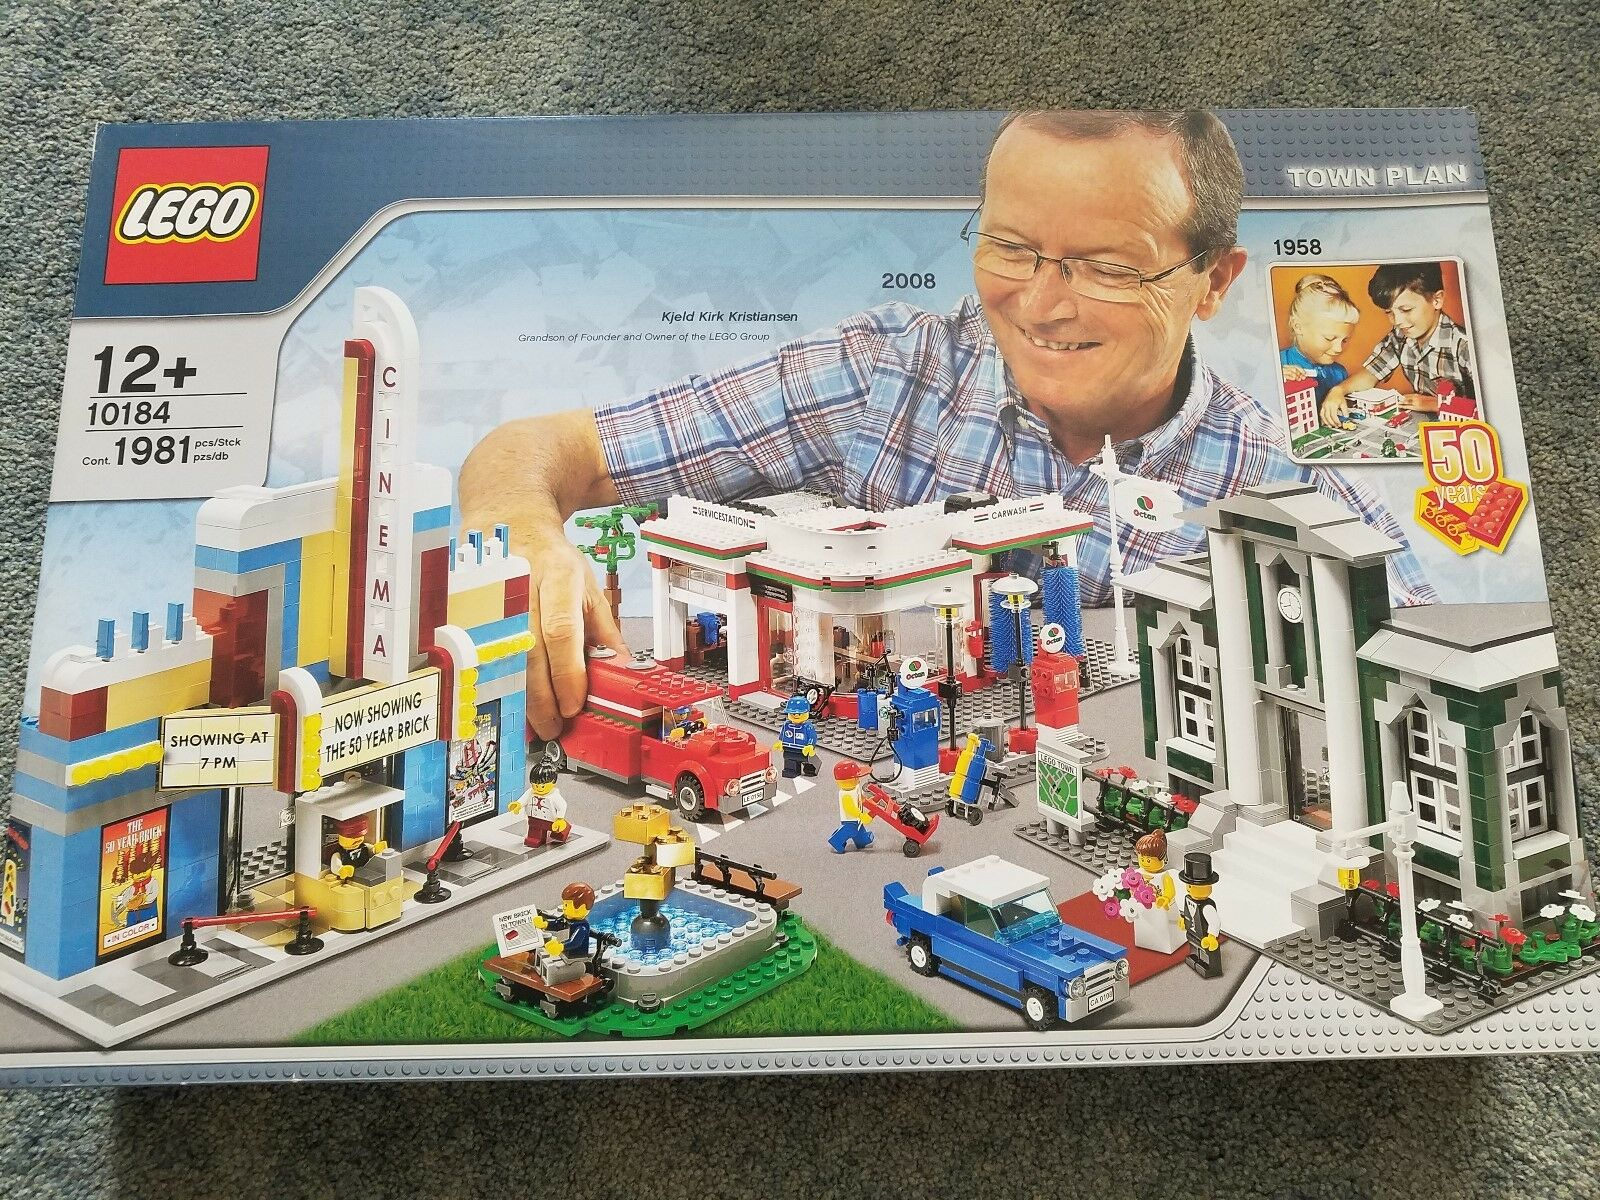 Lego 10184 Town Plan 50th Aniversario Nuevo En Caja Sellada retirado